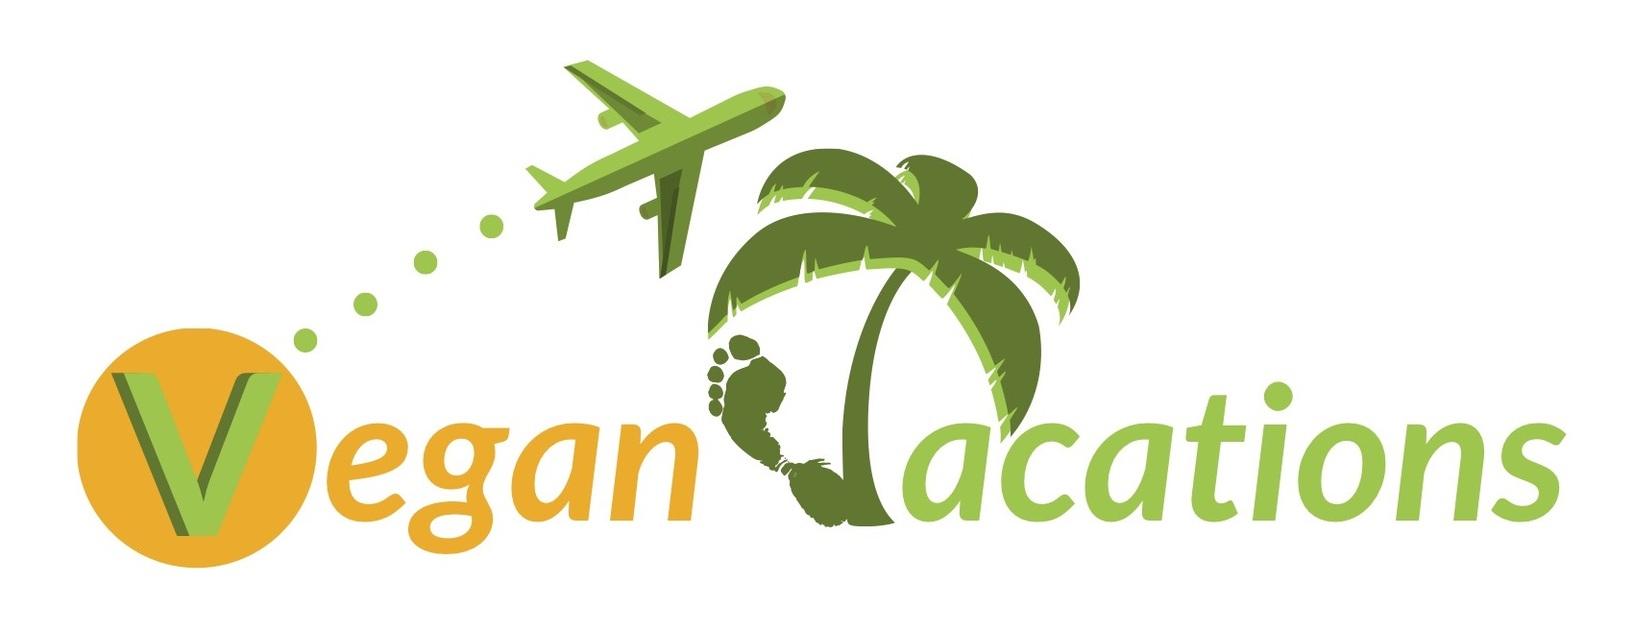 Vegan Vacations